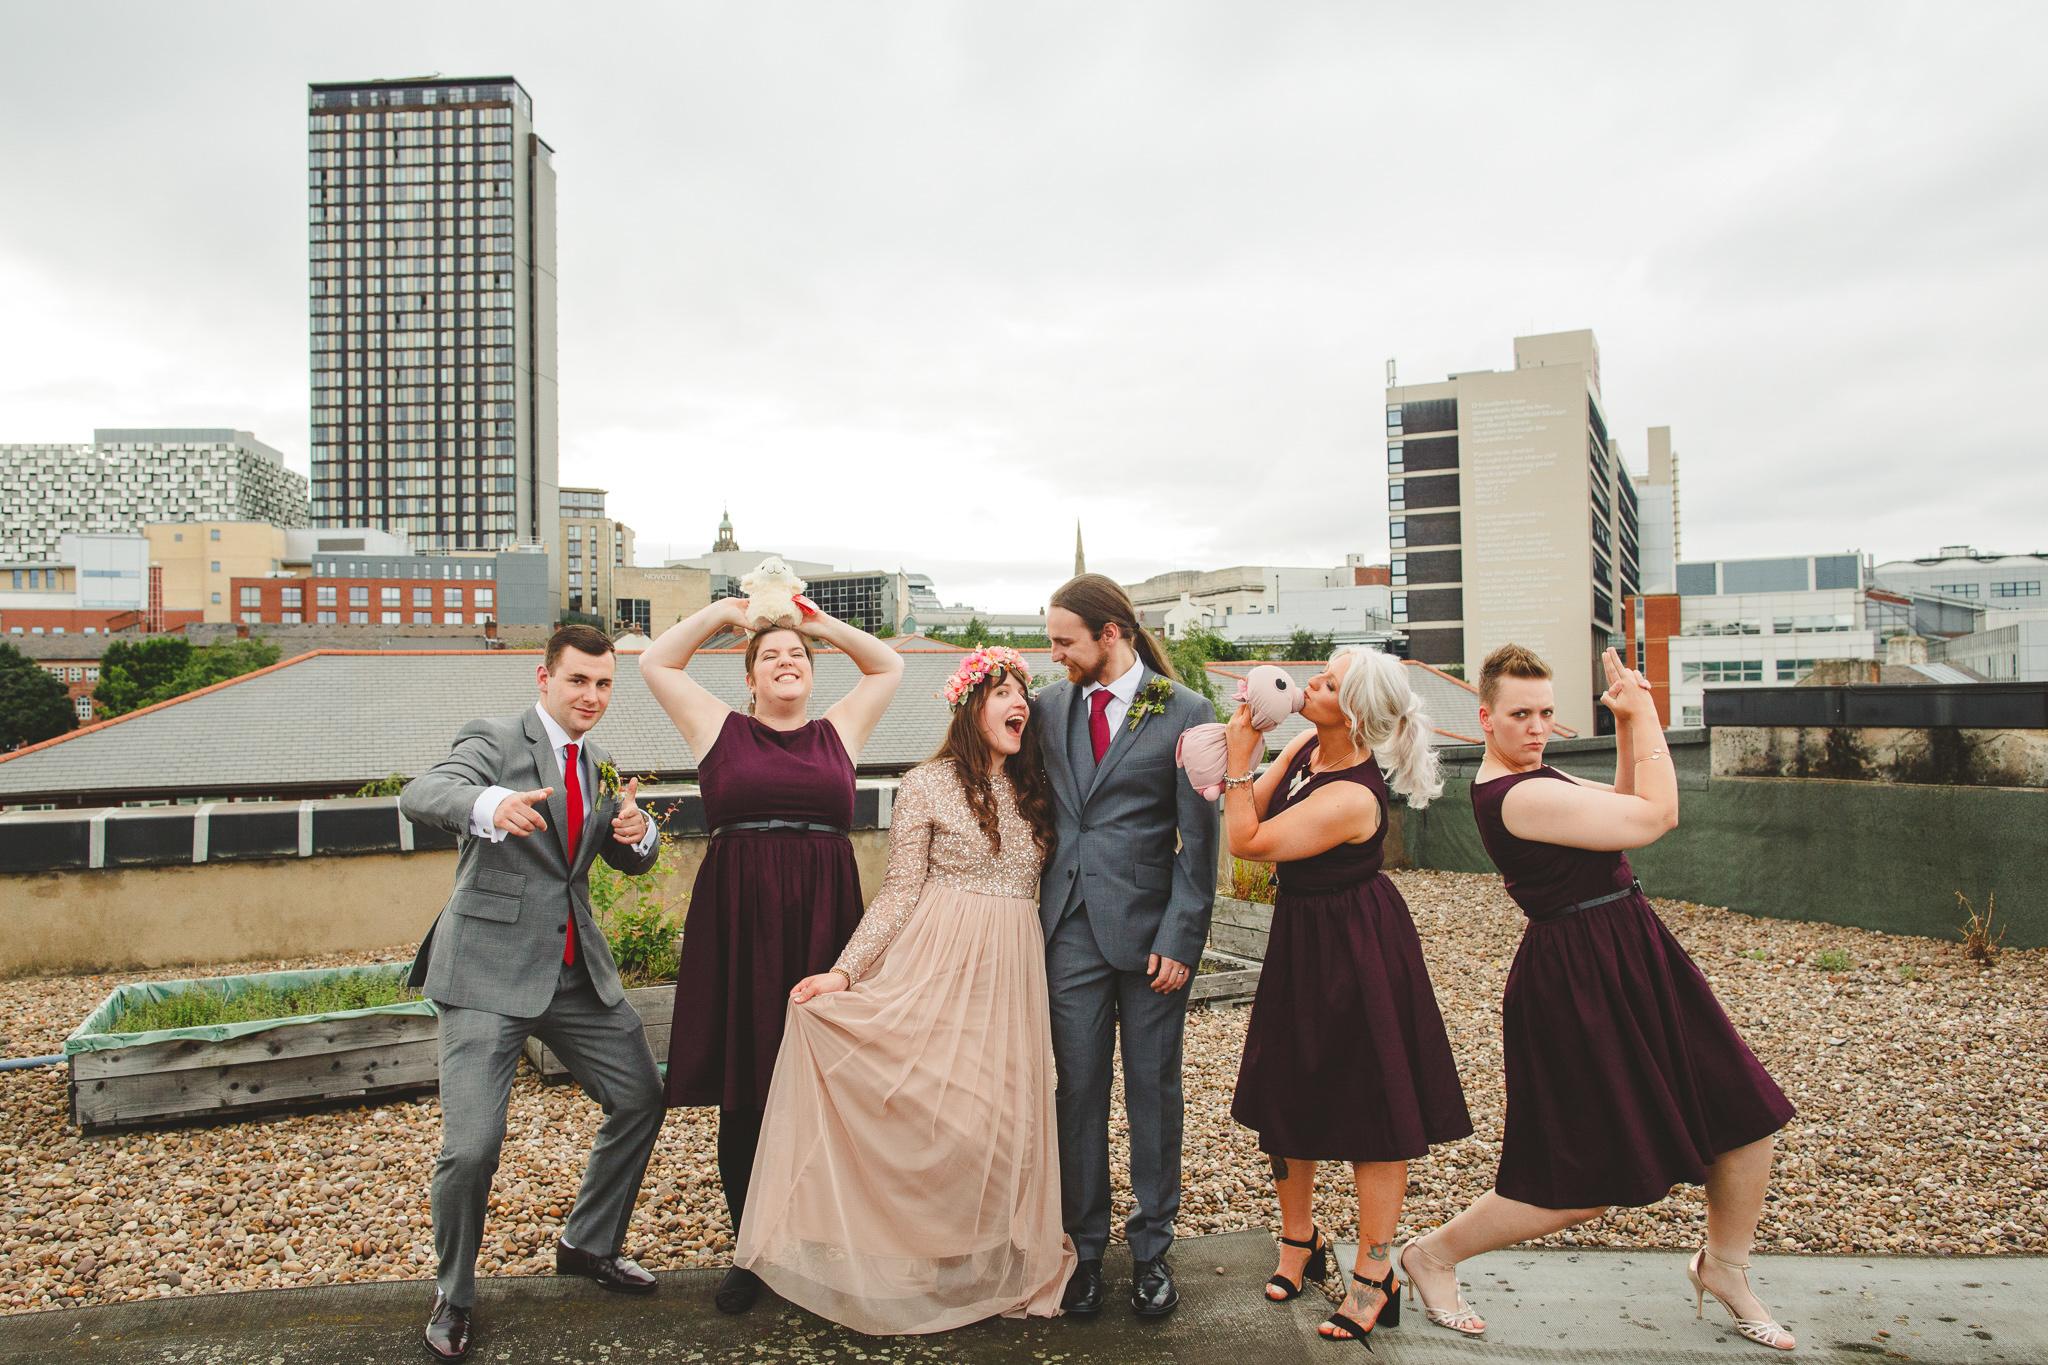 sheffield-wedding-photographer-roxysamblog-33.jpg